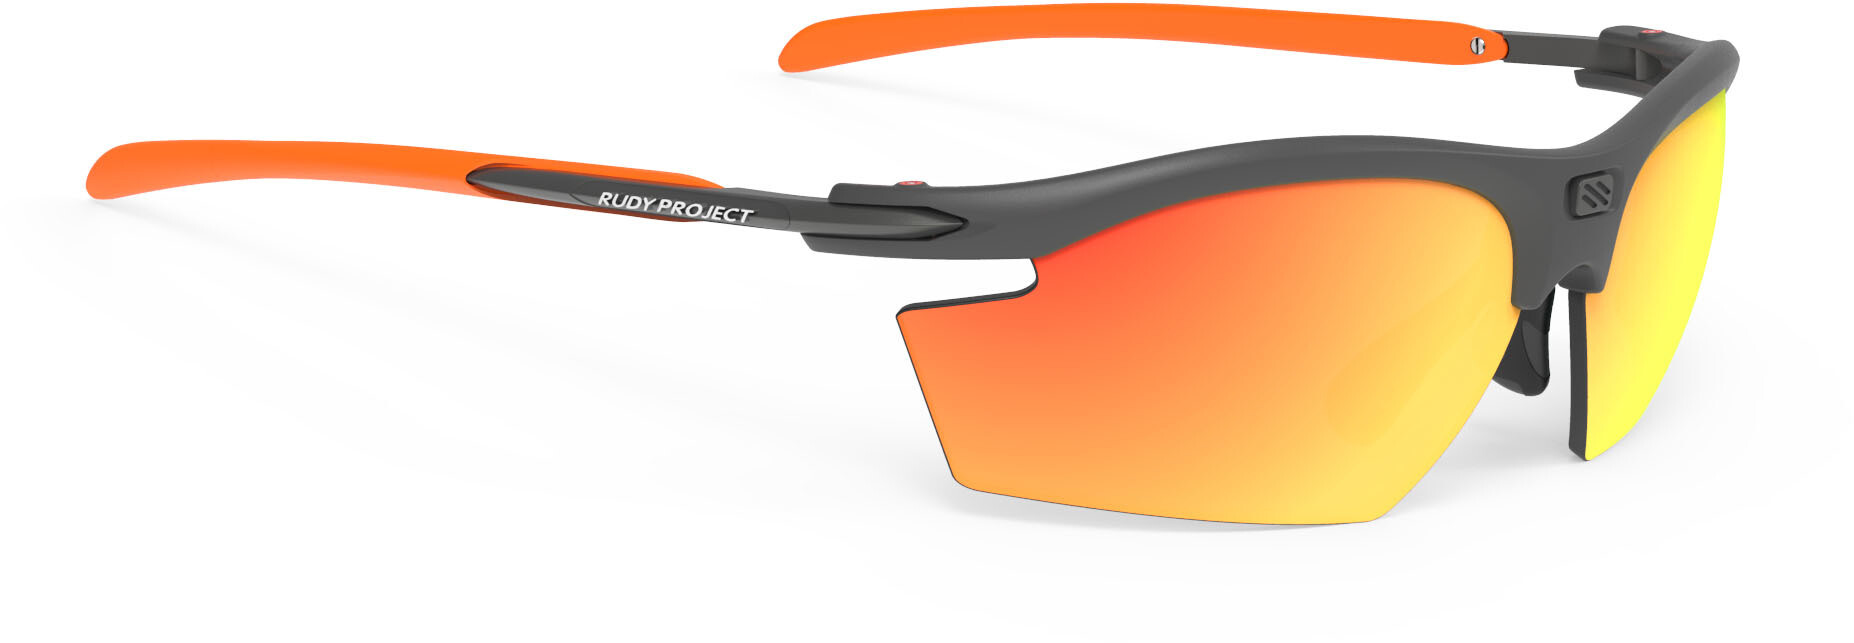 Rudy Project Rydon Cykelbriller, graphite - polar 3fx hdr multilaser orange | Briller